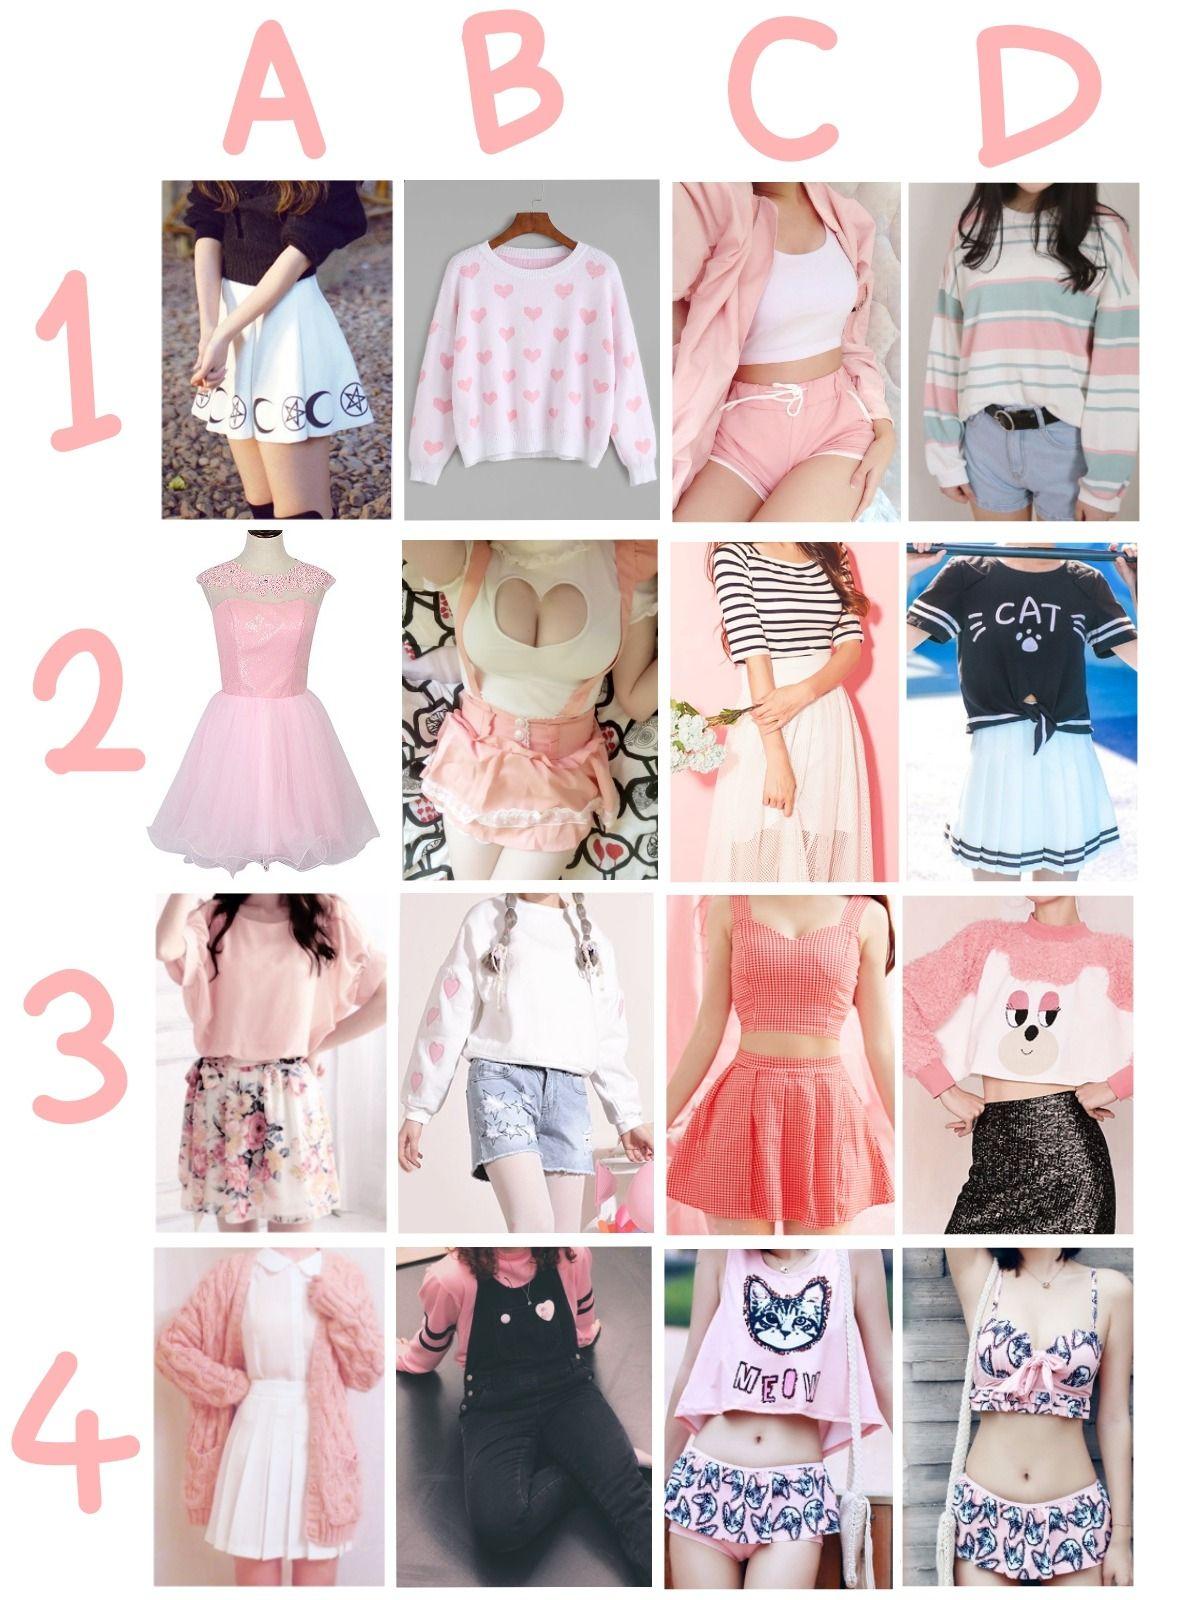 Http Yuukonishigori Tumblr Com Post 161674488231 I Made My Own Fashion Meme Insp Drawing Clothes Fashion Drawing Art Clothes